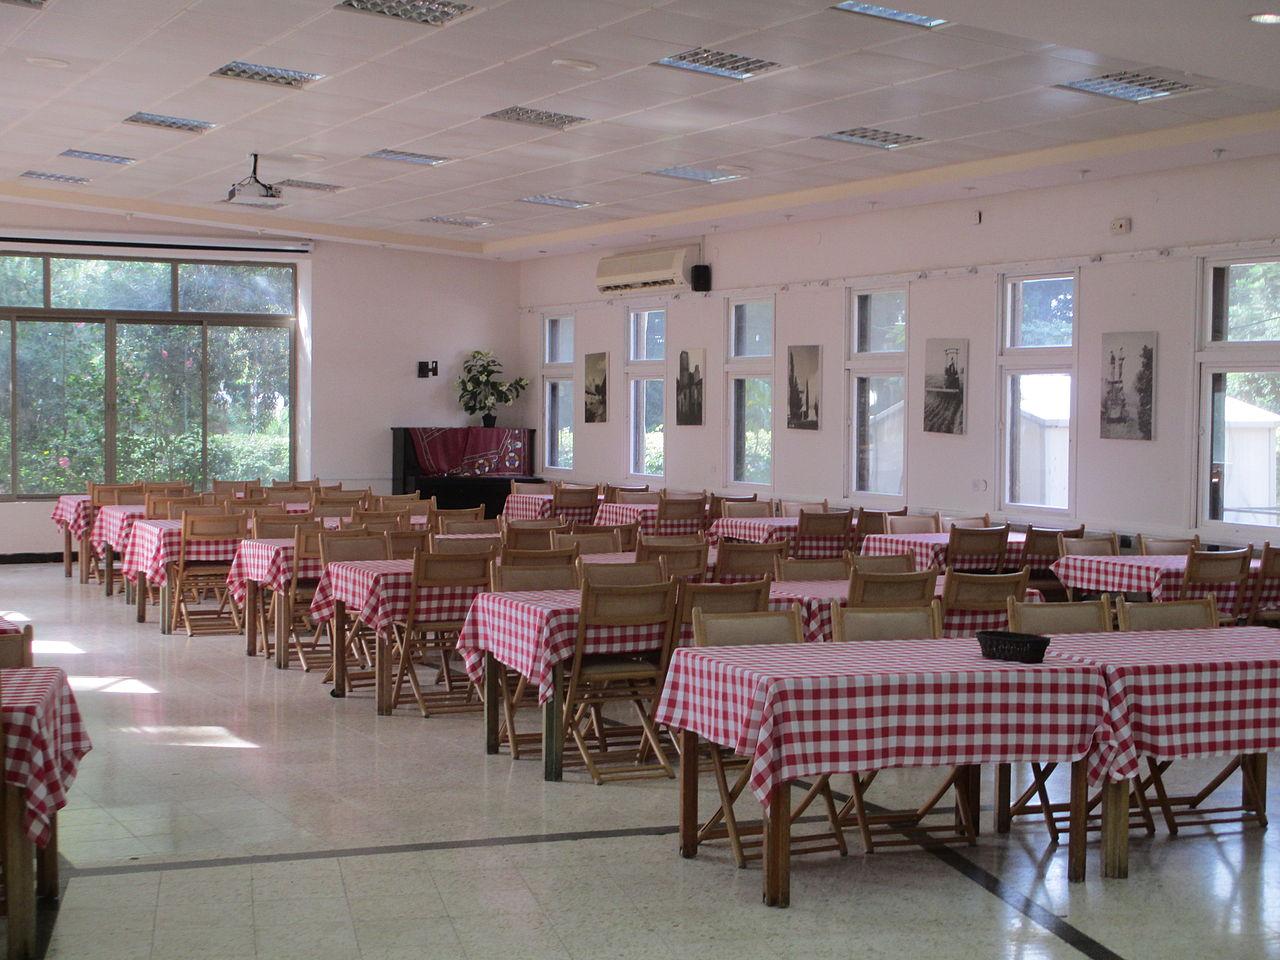 FilePikiWiki Israel 40651 Dining Room In Kibbutz Ramat HaKoveshJPG